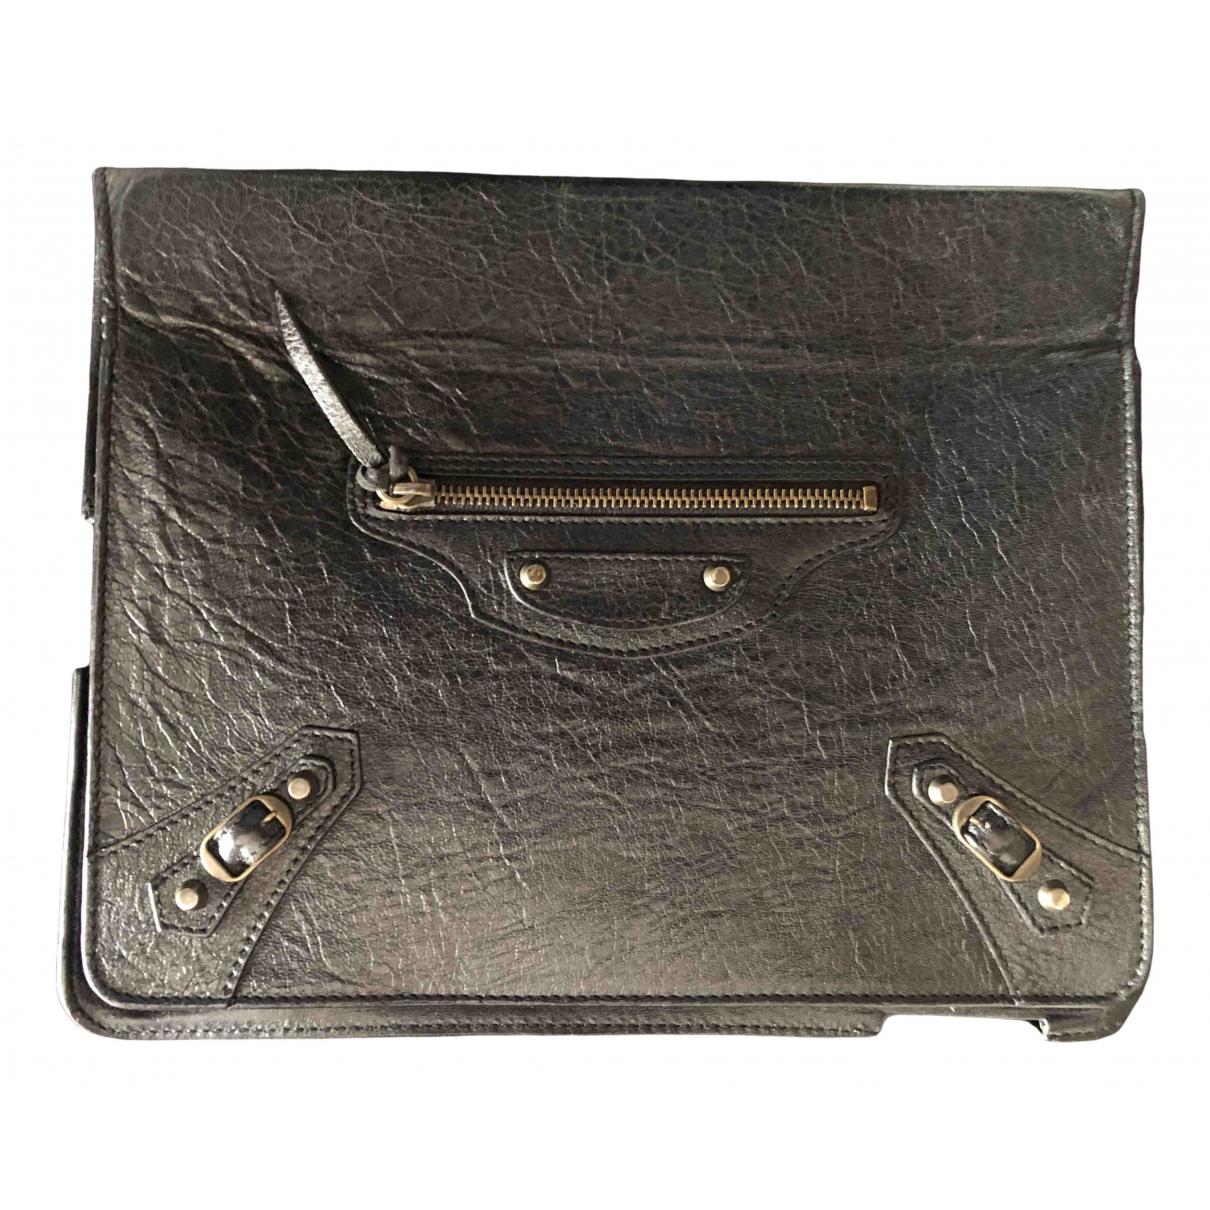 Balenciaga \N Accessoires in  Schwarz Leder